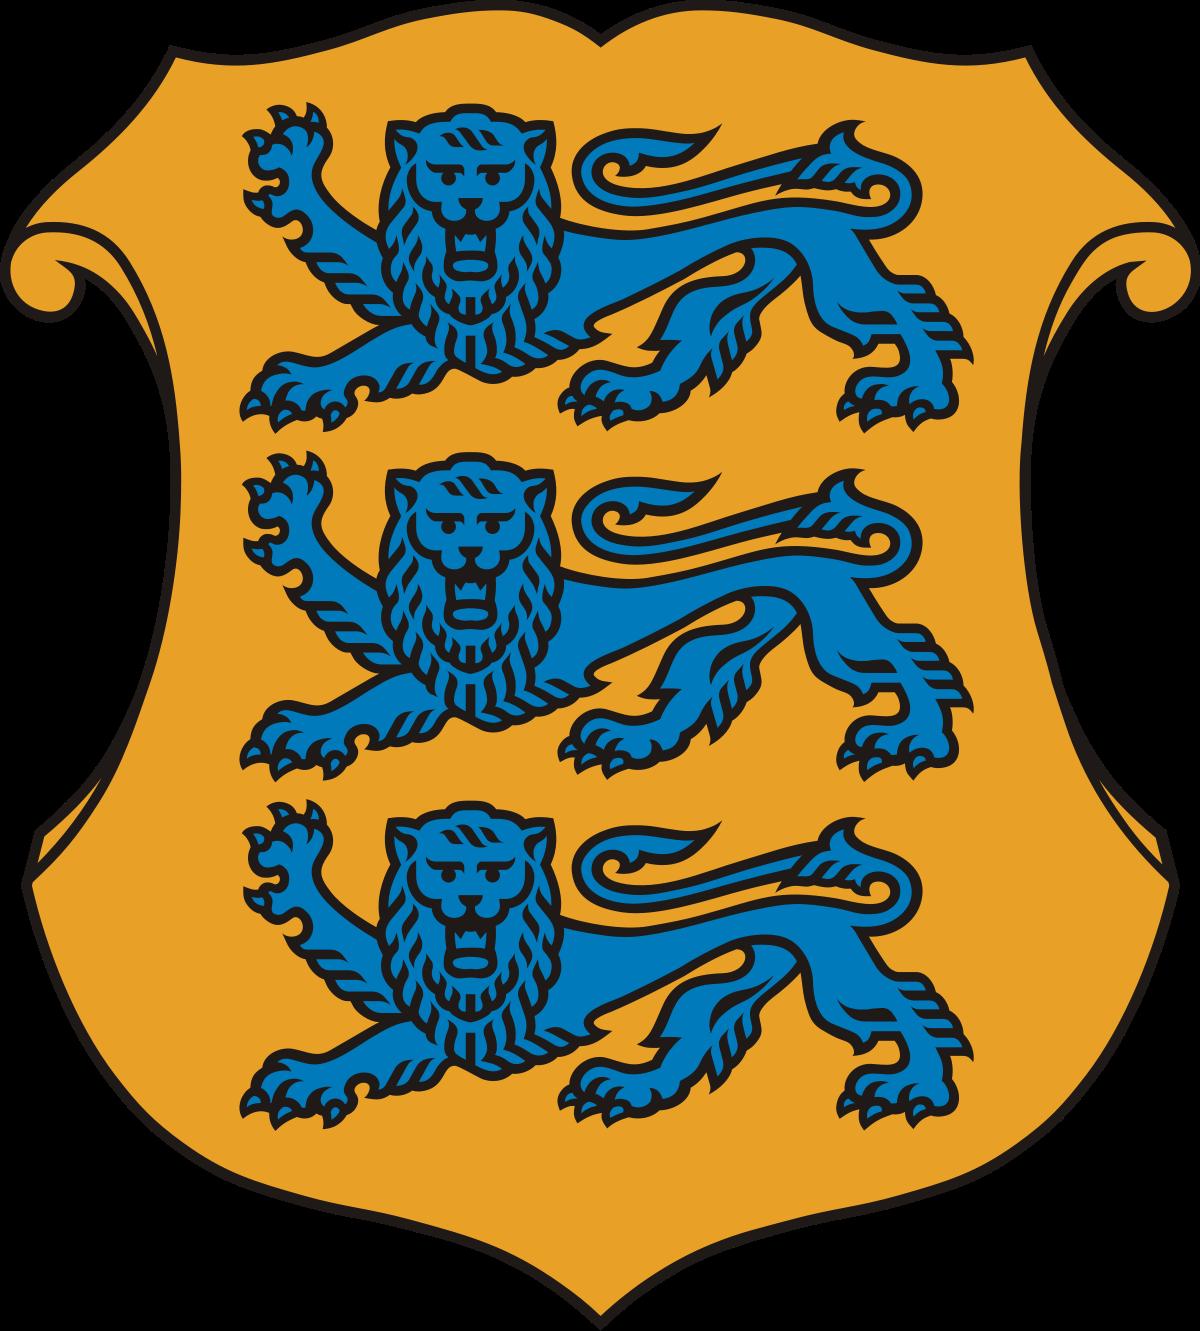 Estonian defence forces wikipedia. Navy clipart bonus army